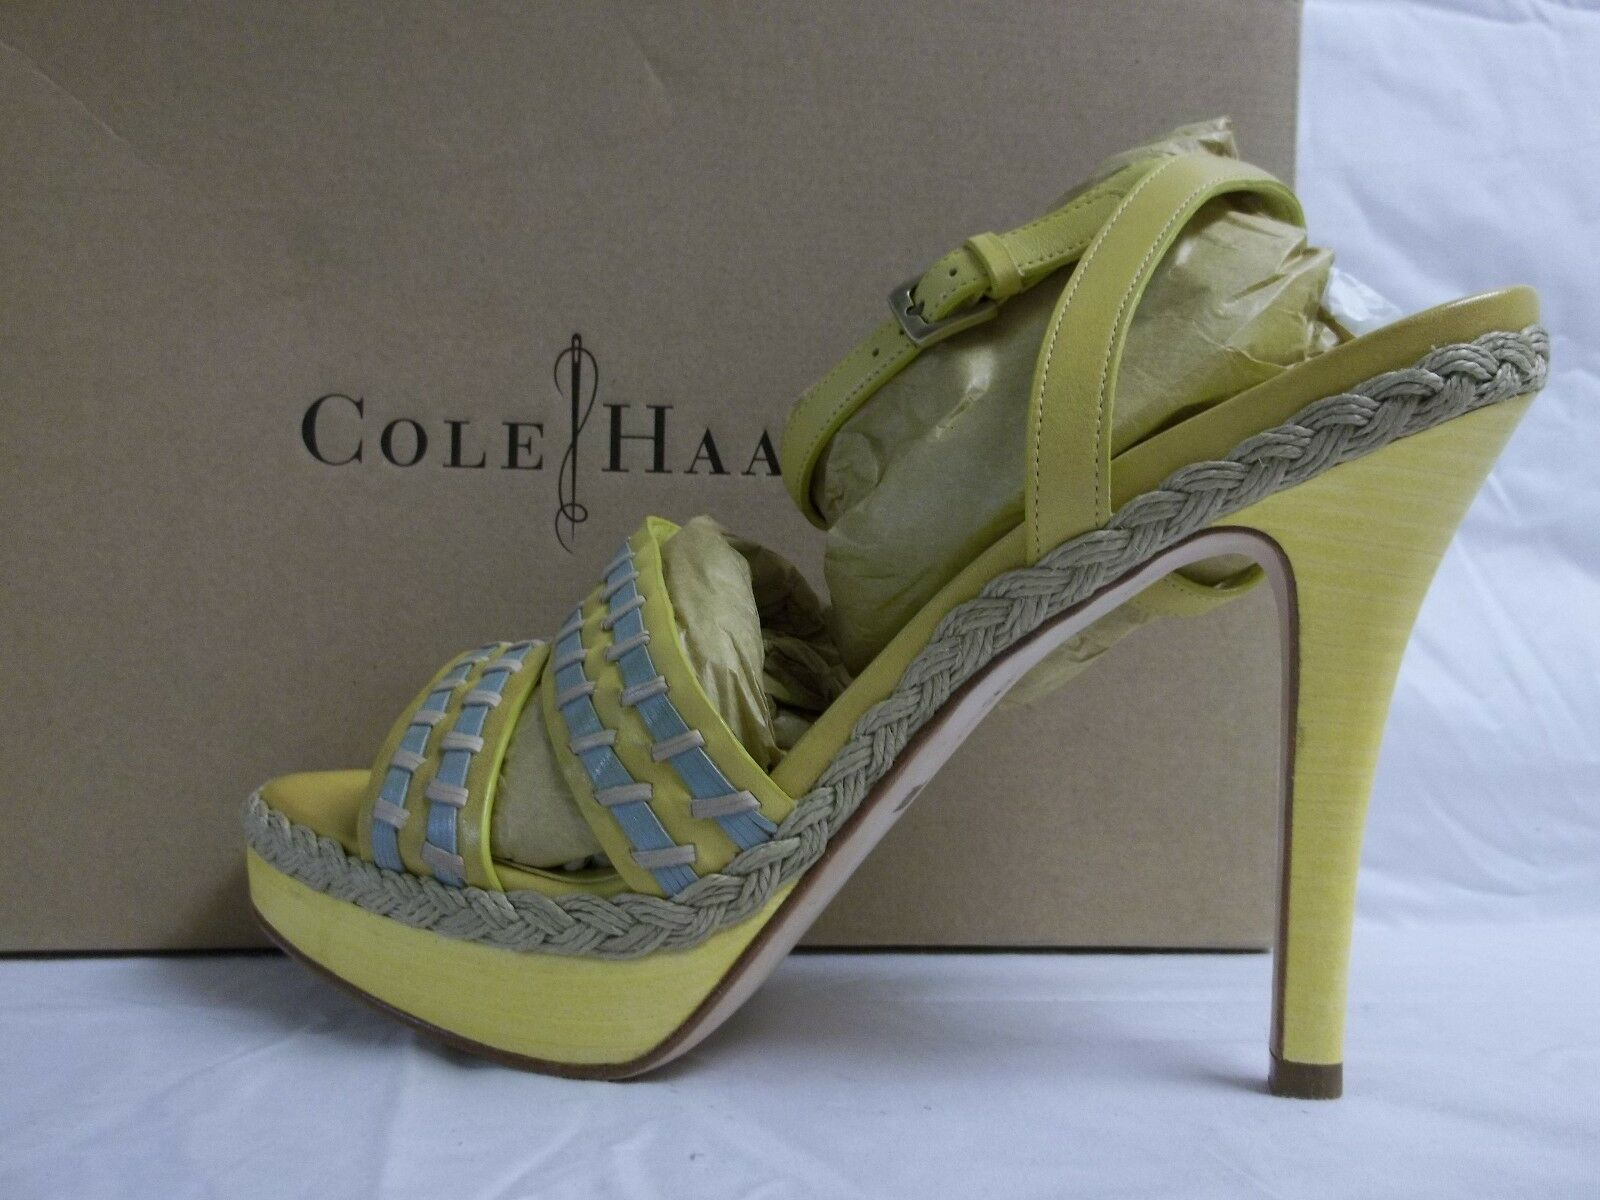 Cole Haan Größe 8.5 Vanessa Chick Sea Ankle Strap Open Toe Heels NEU Damenschuhe Schuhes